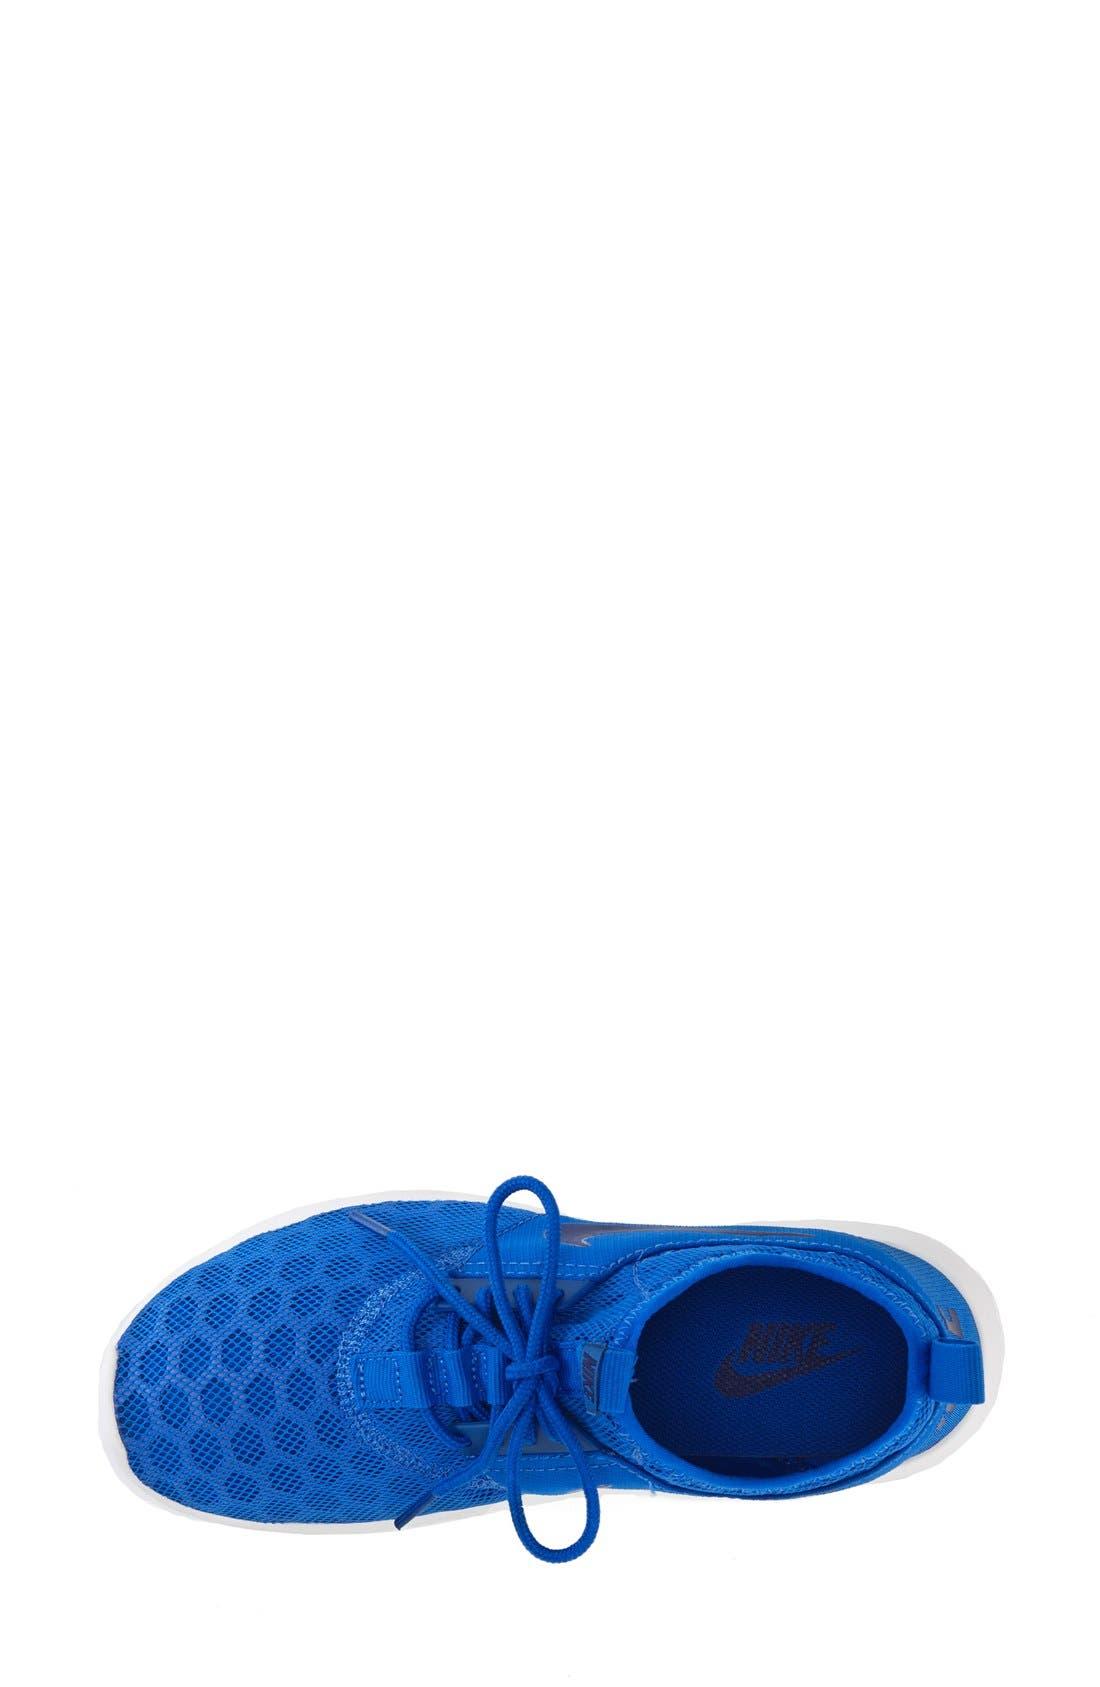 ,                             'Juvenate' Sneaker,                             Alternate thumbnail 198, color,                             400